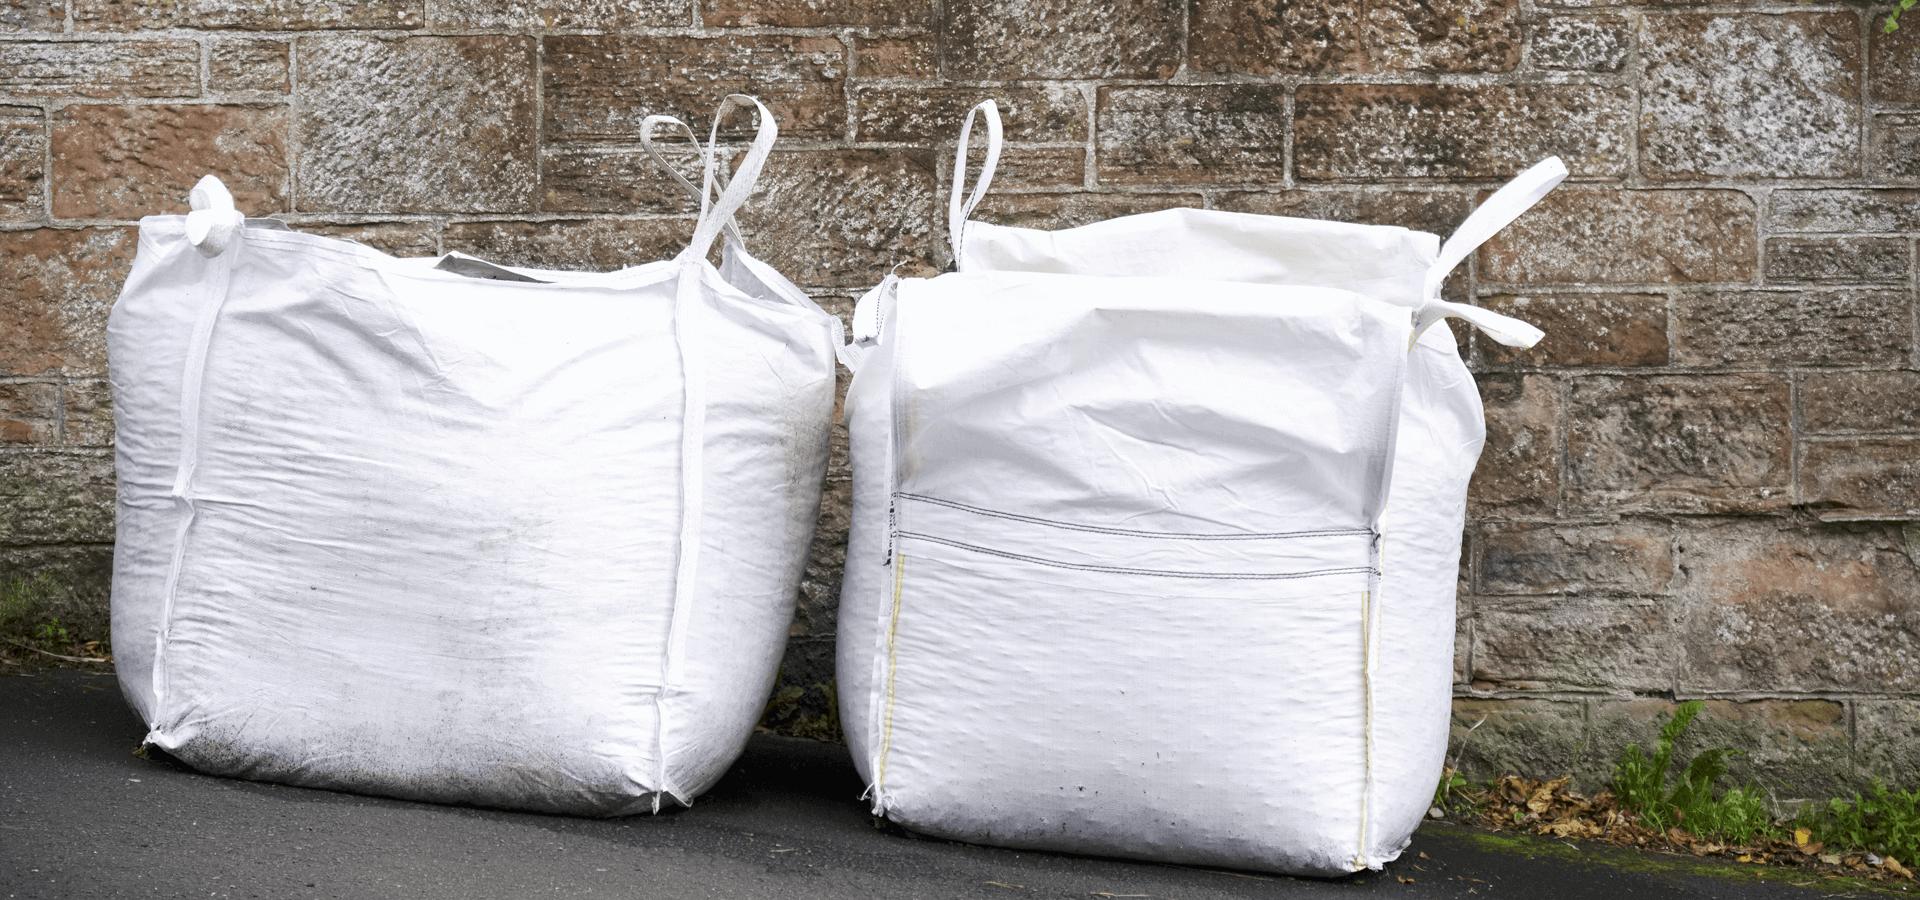 Are decorative aggregates the same as gravel?